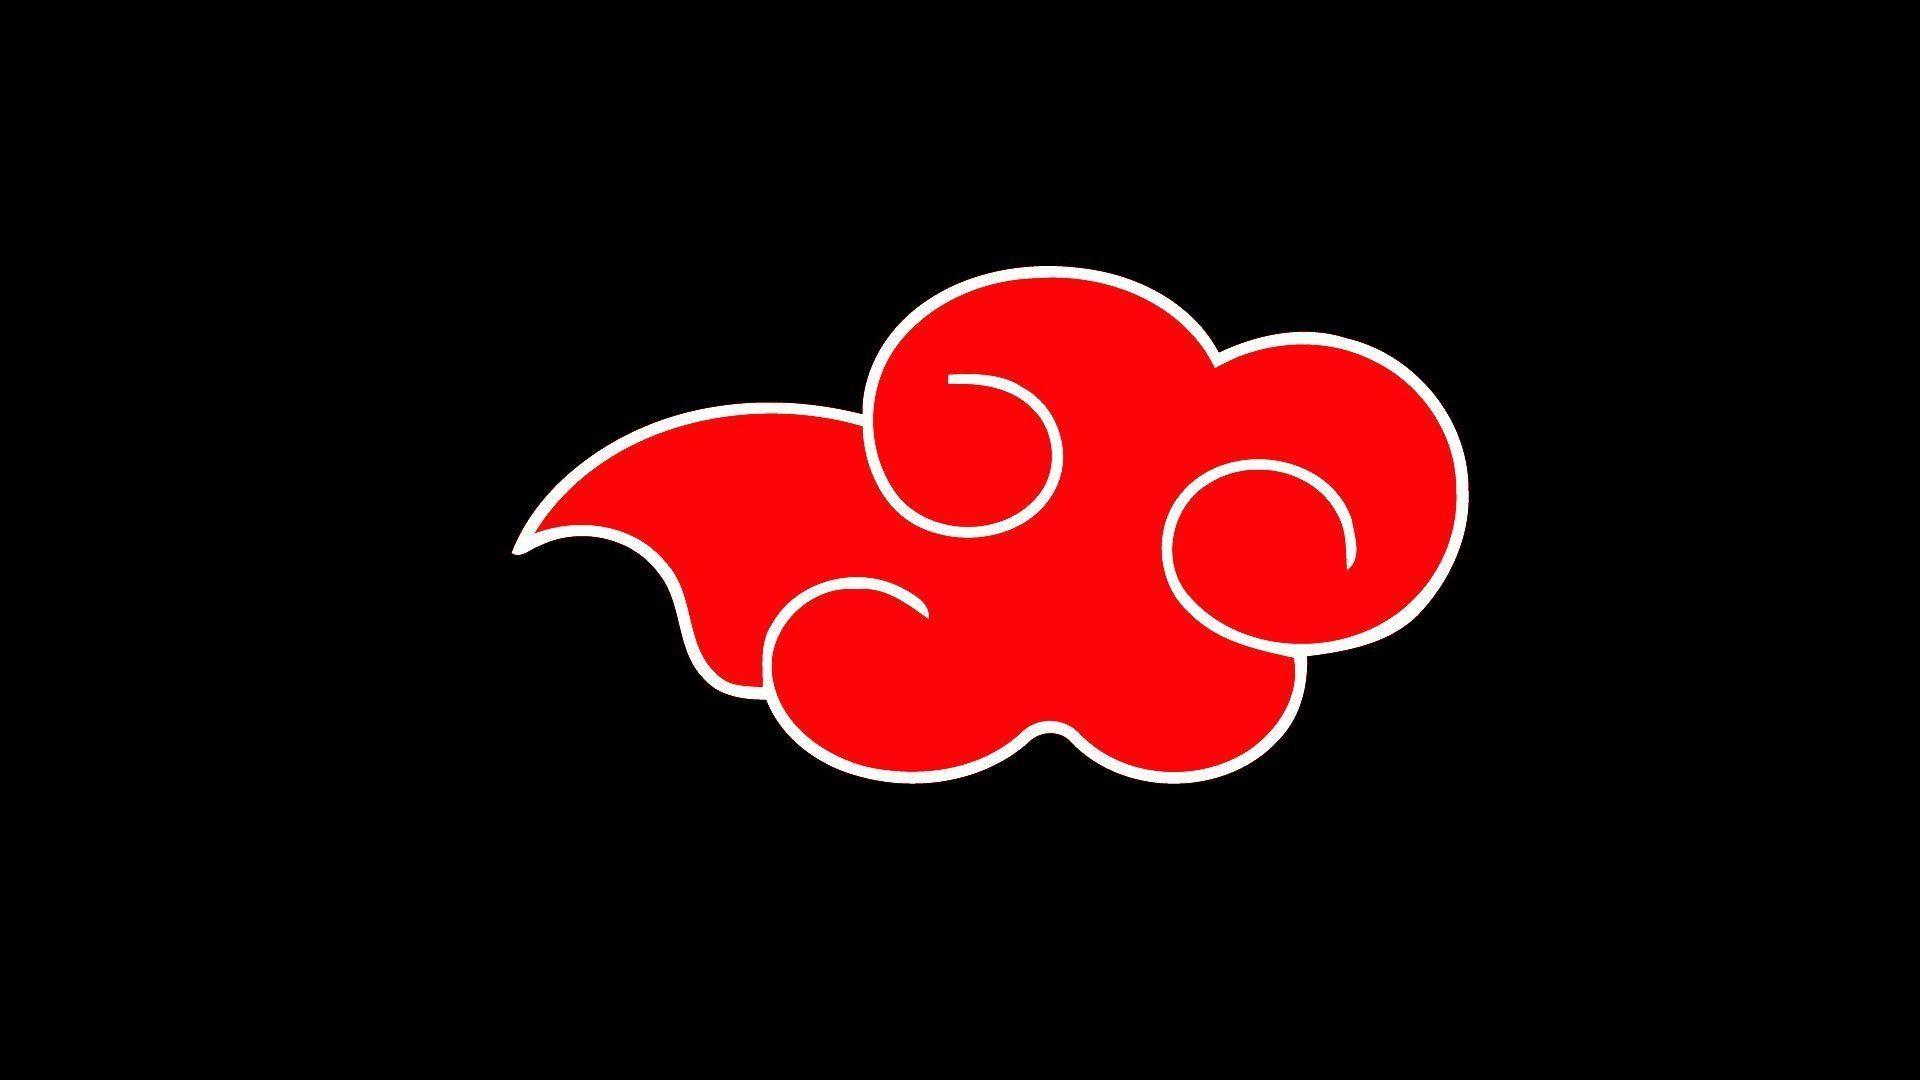 Uchiha Clan Symbol Hd Wallpaper Many Hd Wallpaper